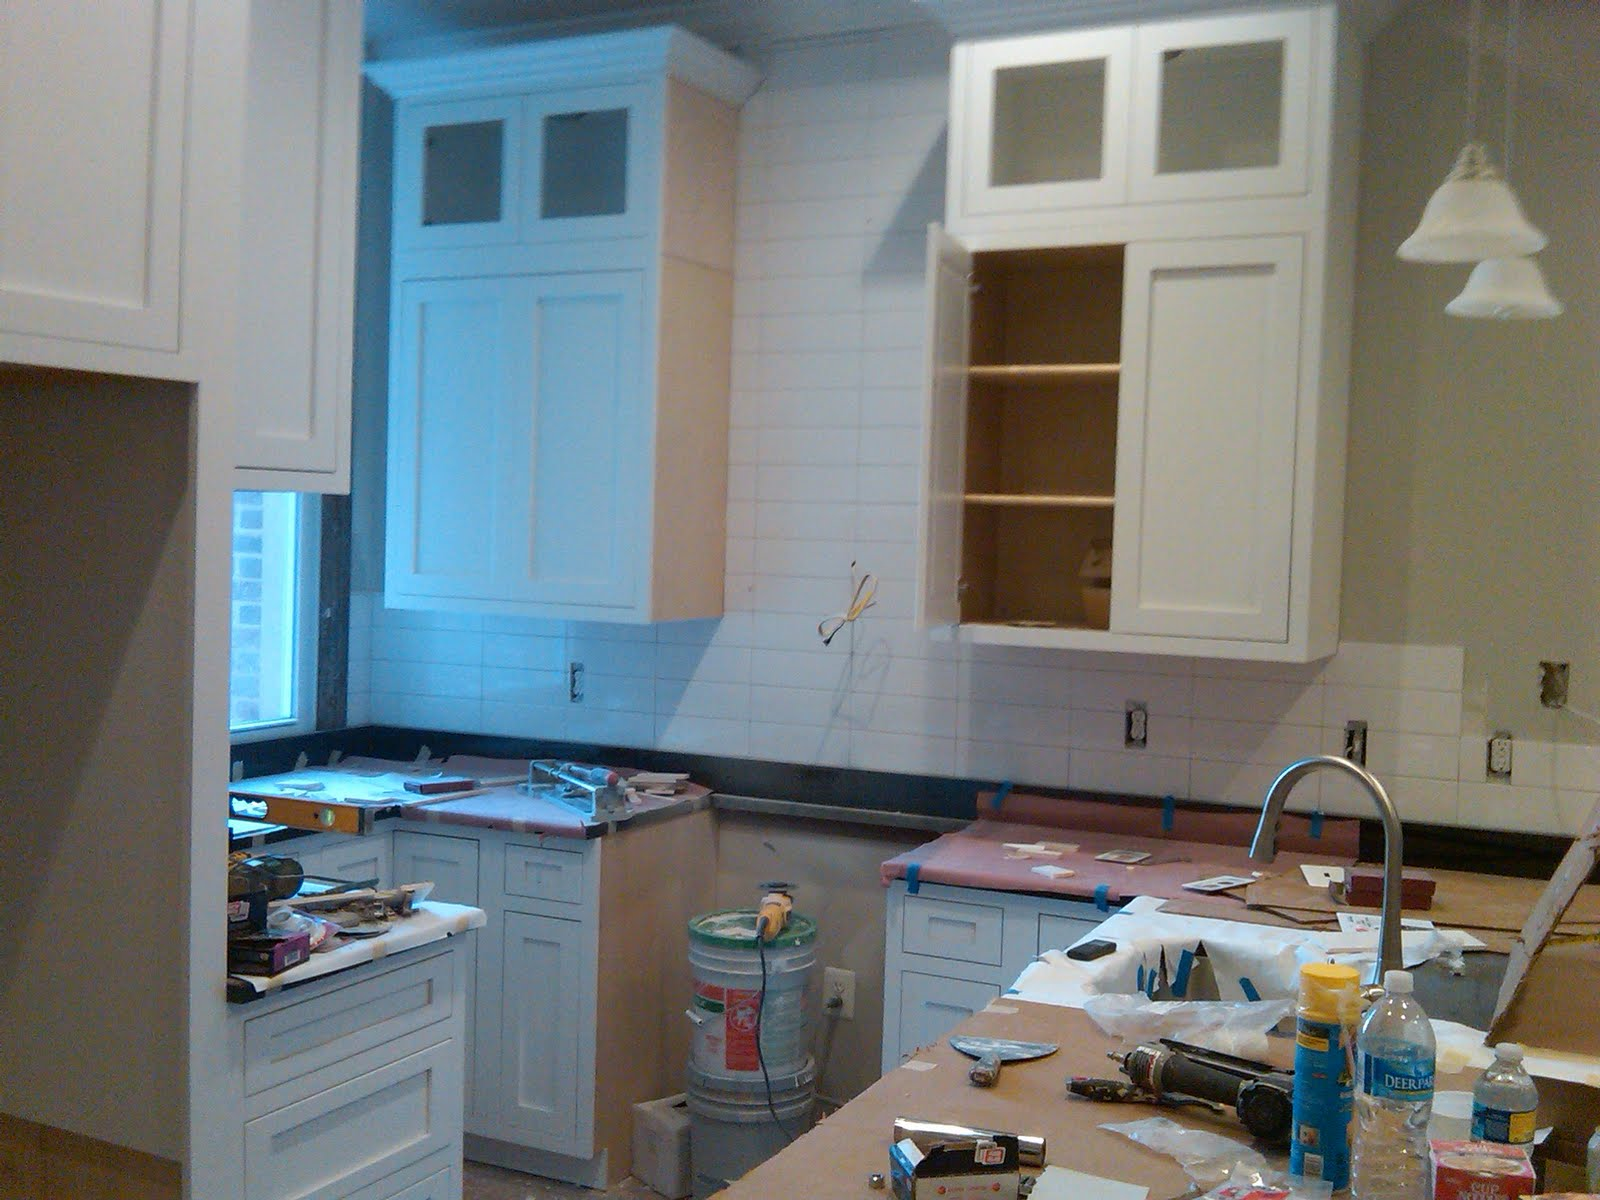 1221 12th St- More Progress   A Washington, DC Development Firm